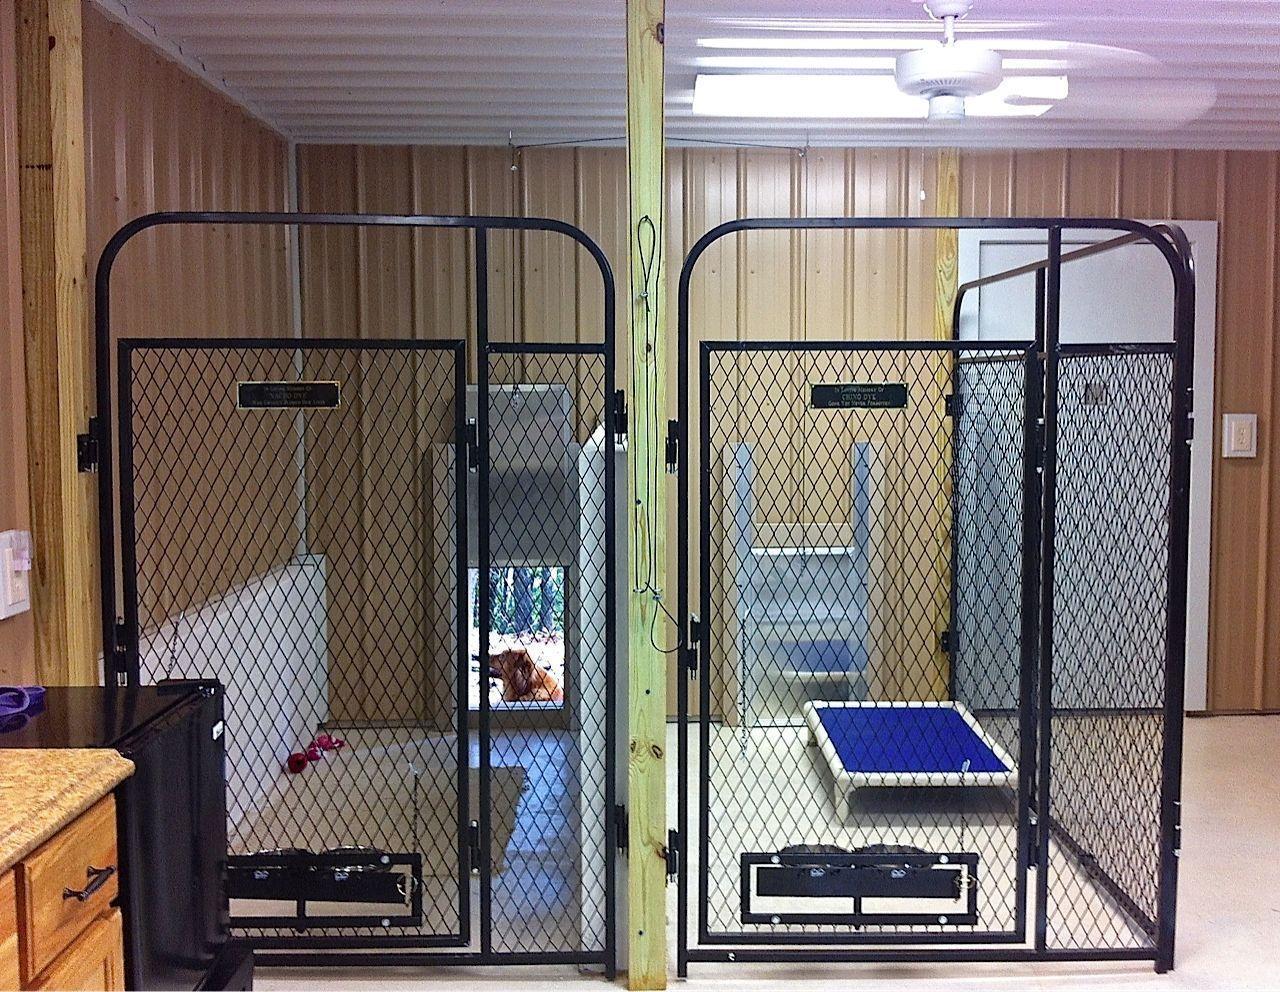 45 Outdoor Pet Room Design Ideas That Look Cute Dog Kennel Designs Dog Kennel Indoor Dog Kennel